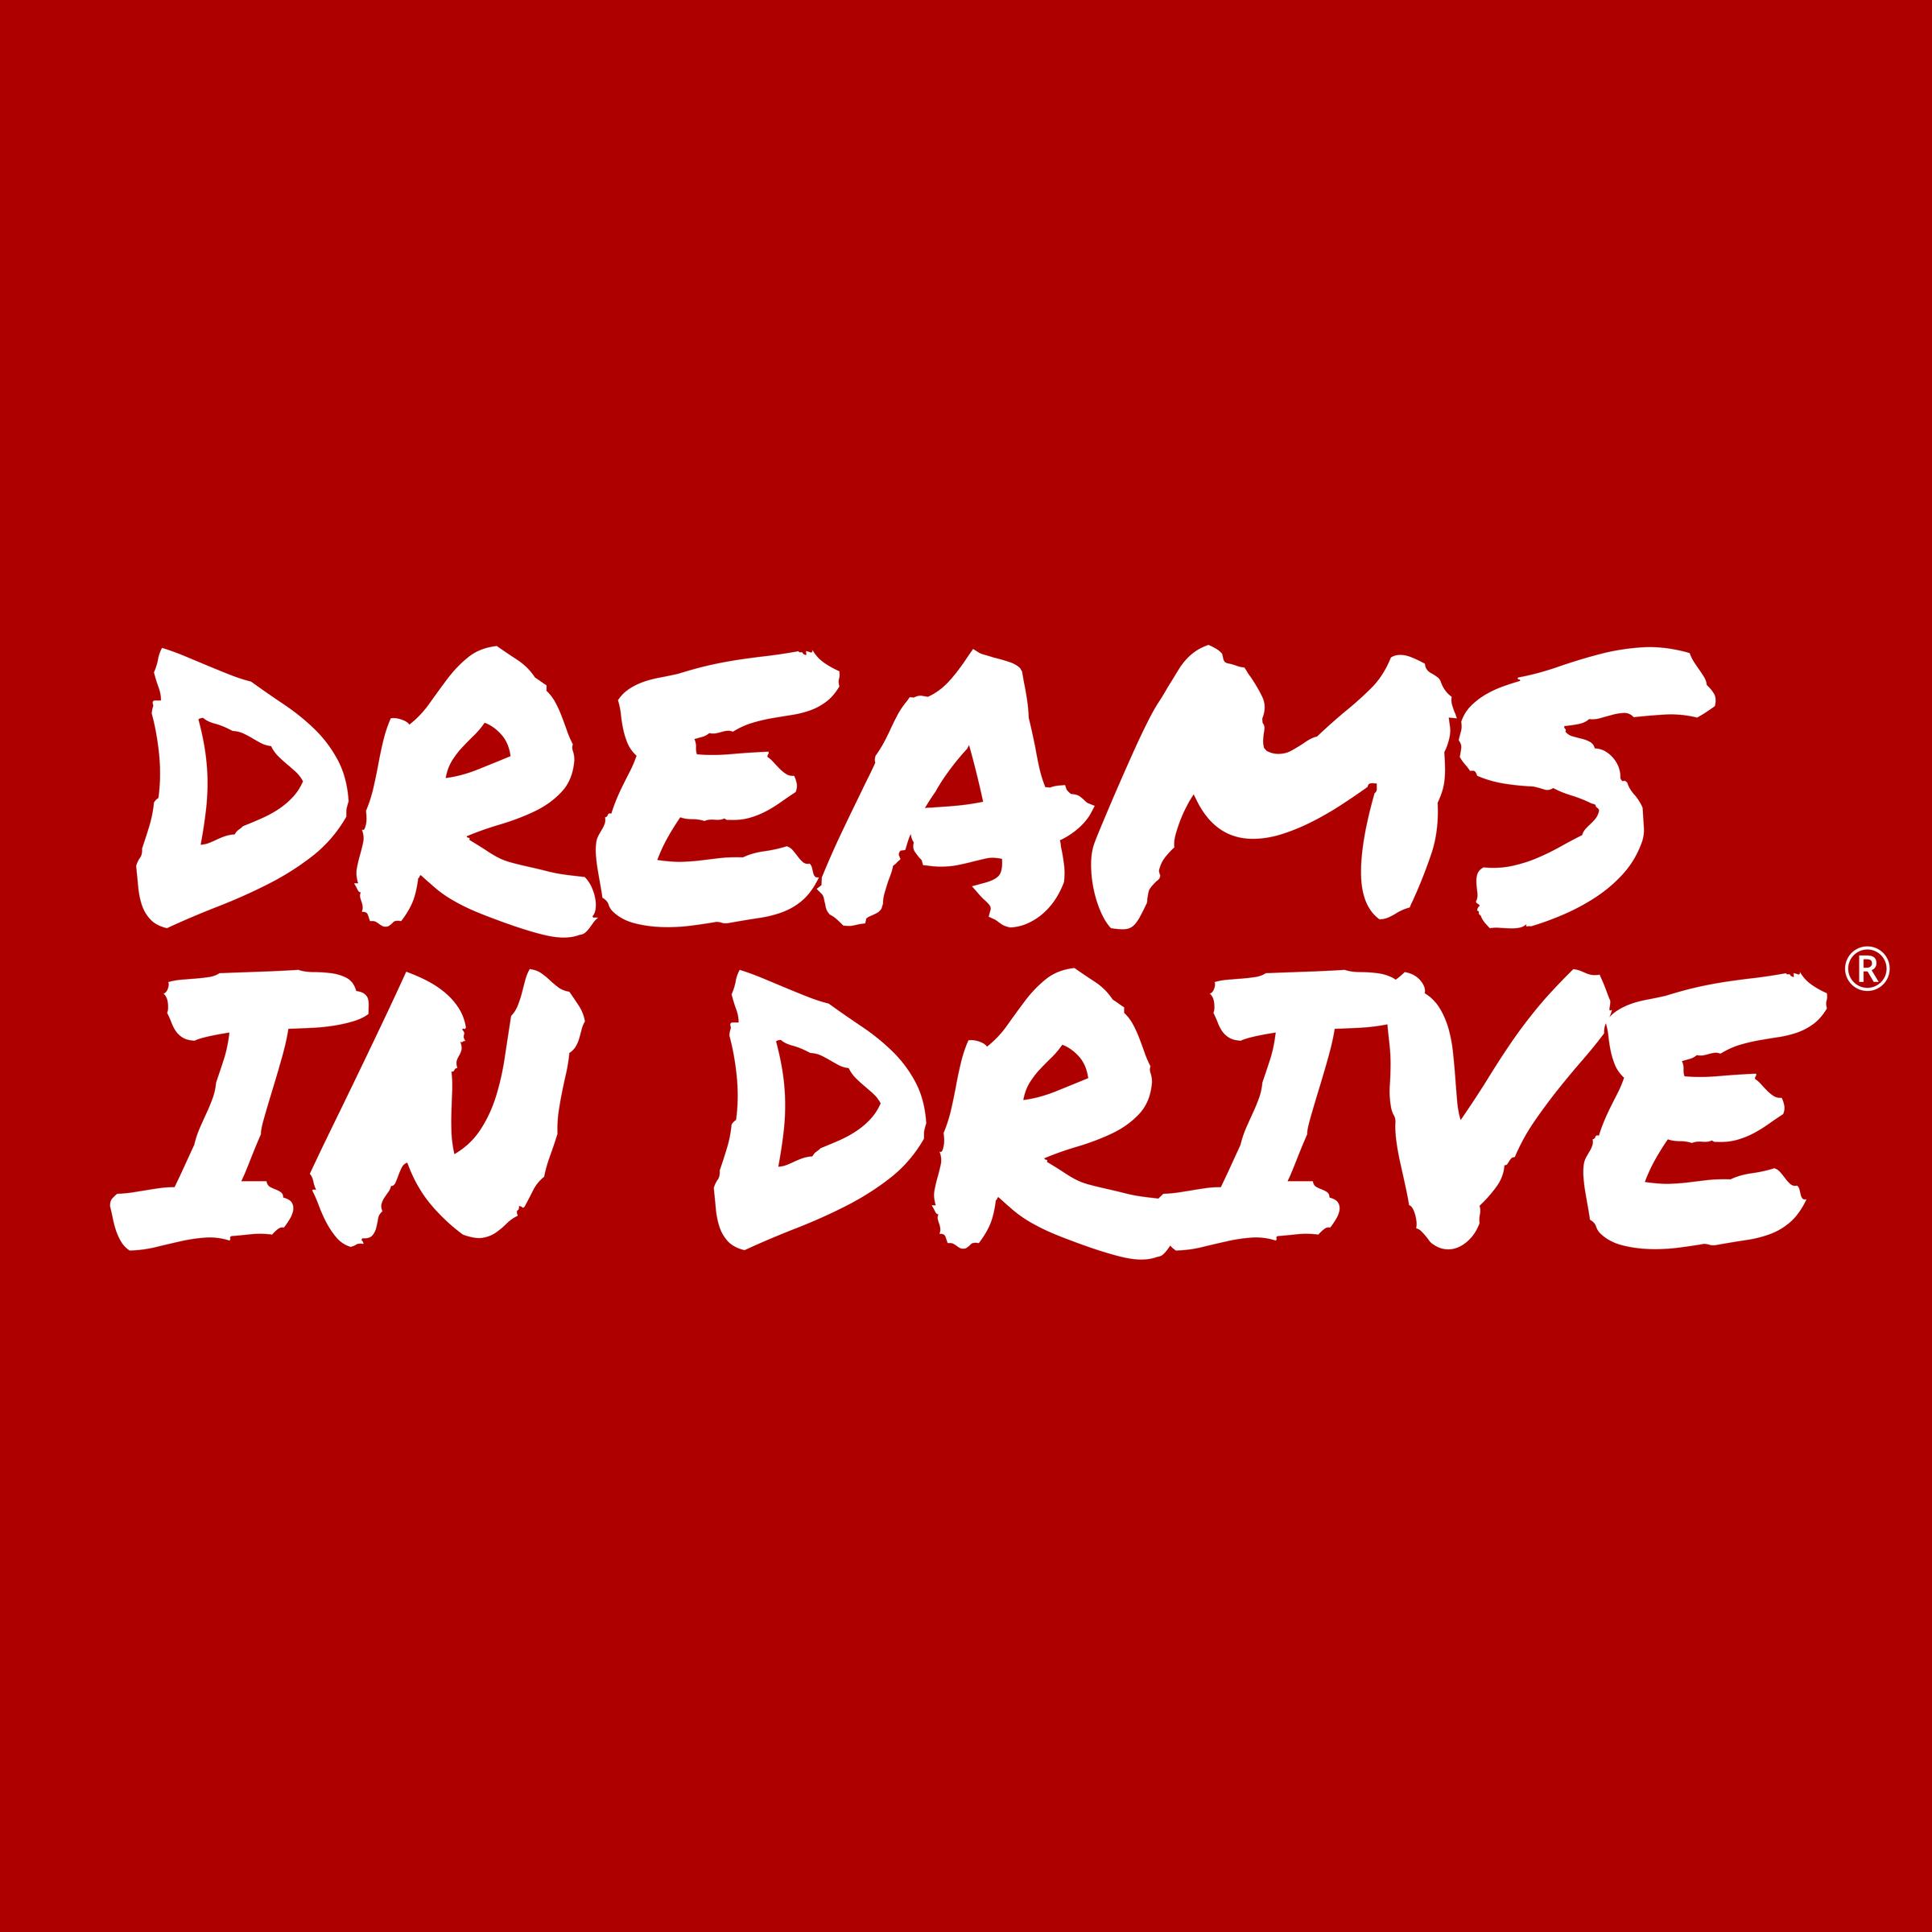 4c11c196e 197  How Dream Driver Shauna Hollinger Mastered Social Media   Grew Her  Online Vegan Brand Dreams In Drive podcast